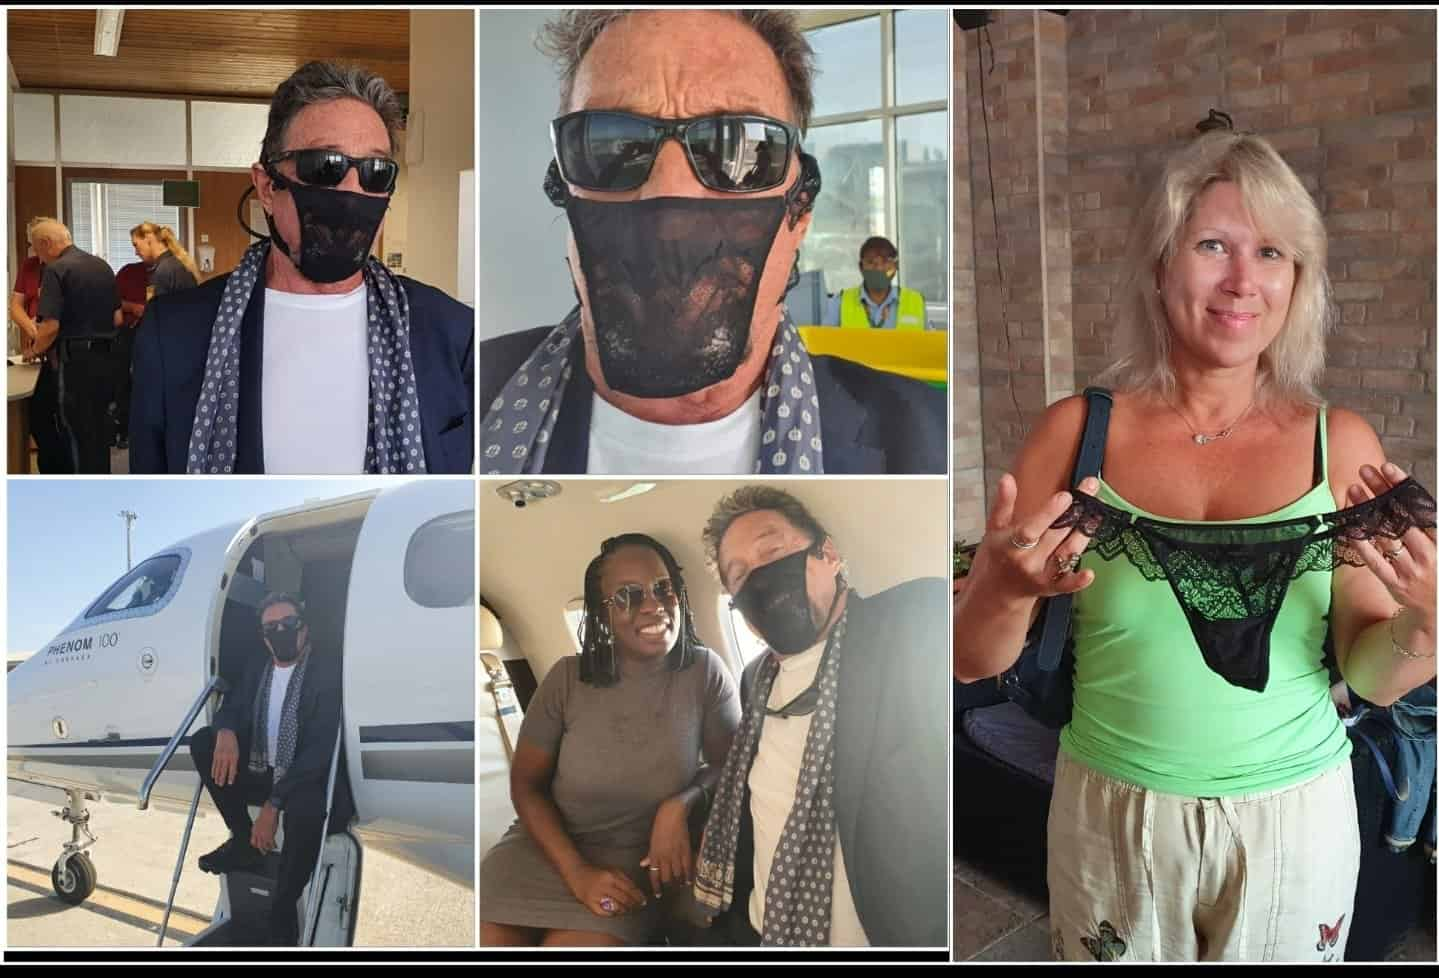 John McAfee Detained For His Coronavirus Mask. Source: Twitter